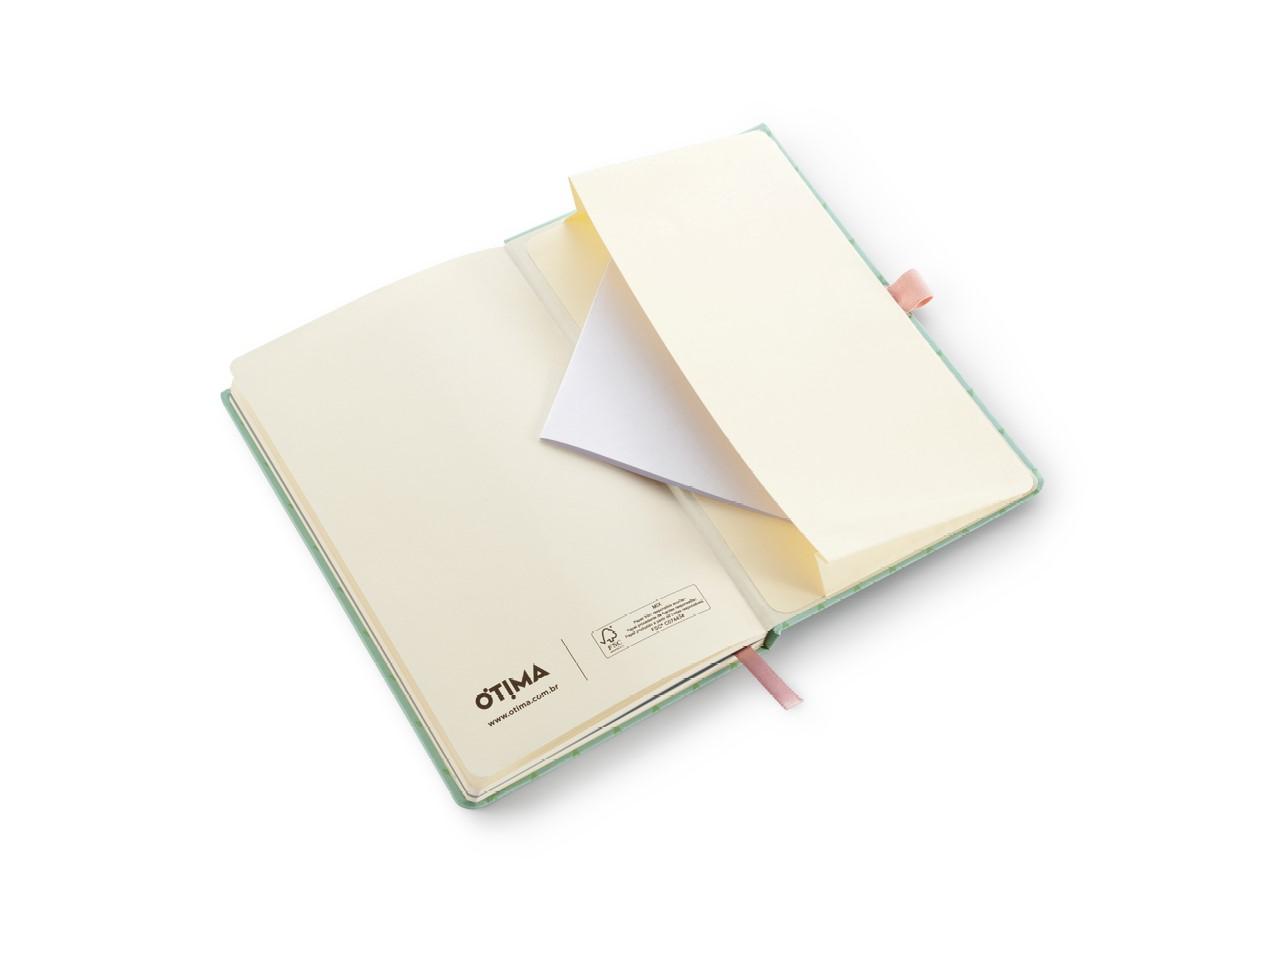 PaperTalk Maxi Pautado Verde Riccio